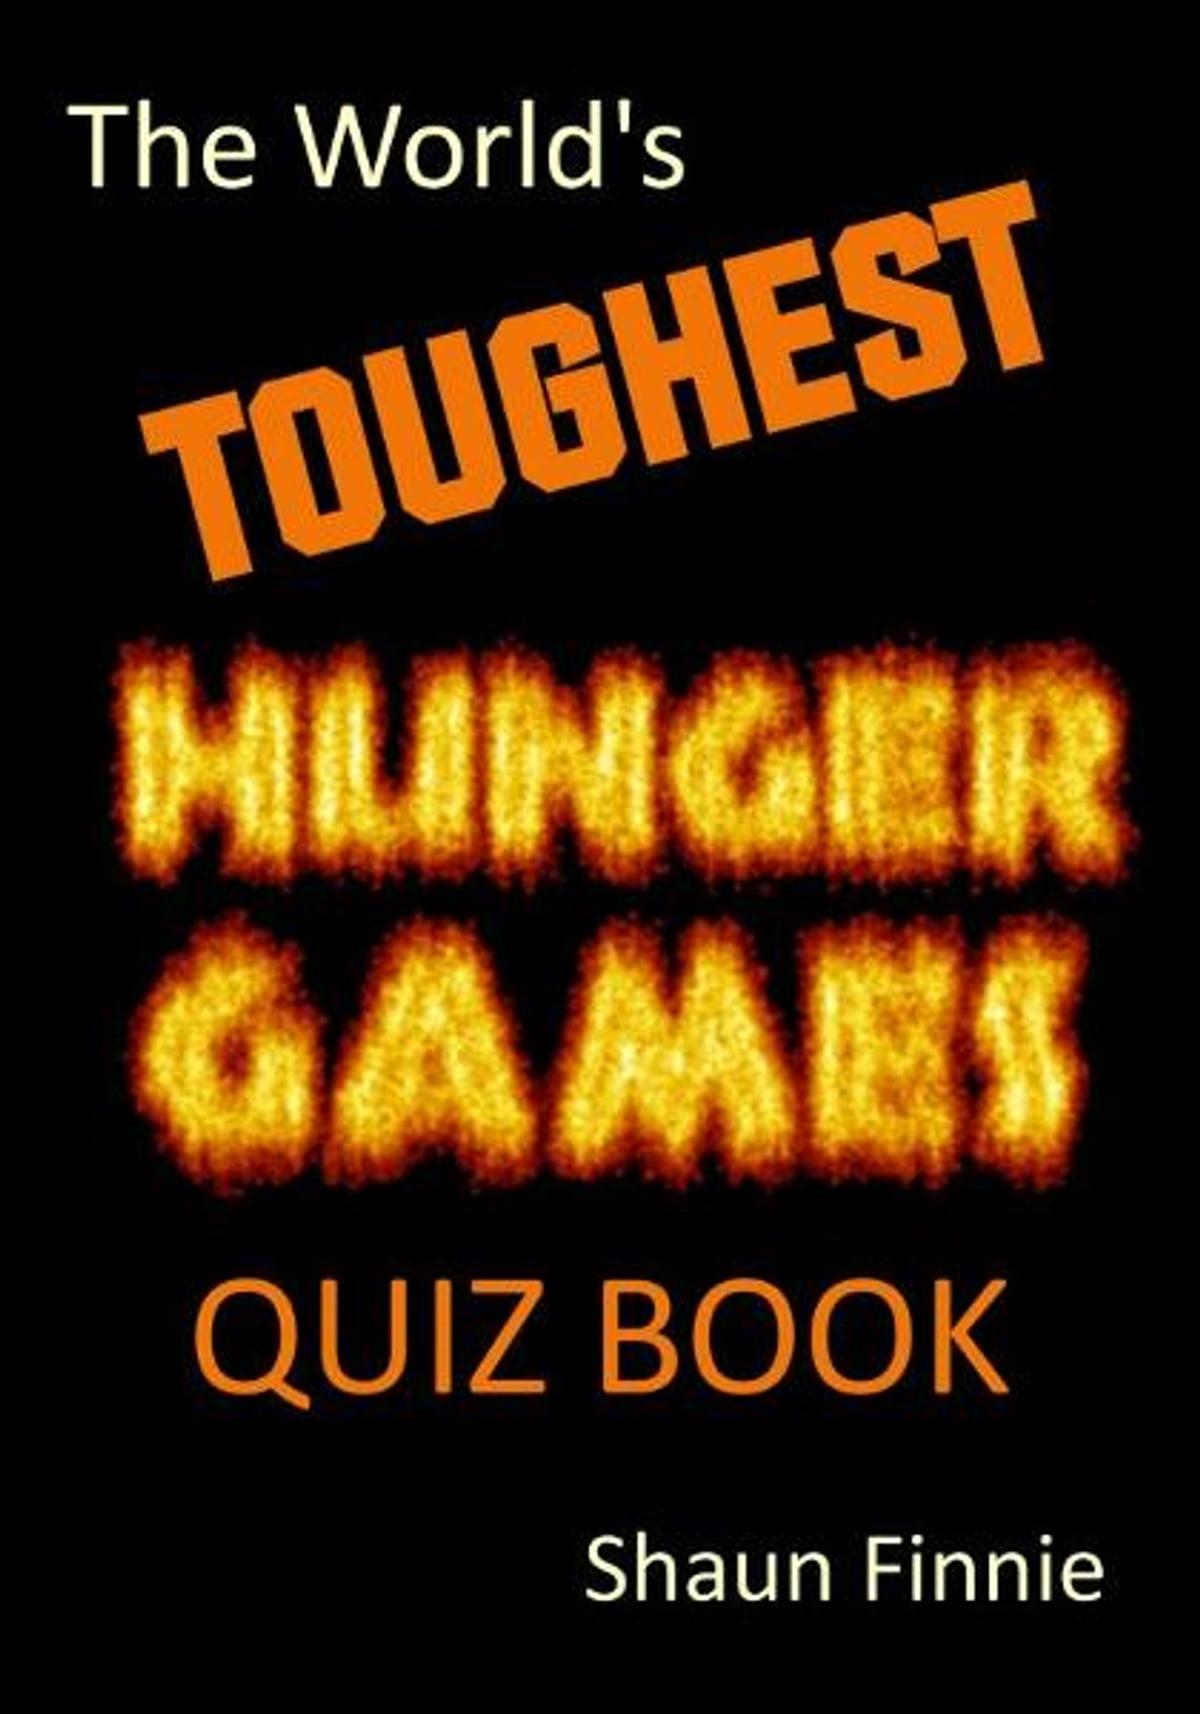 The World S Toughest Hunger Games Quiz Book Ebook Por Shaun Finnie